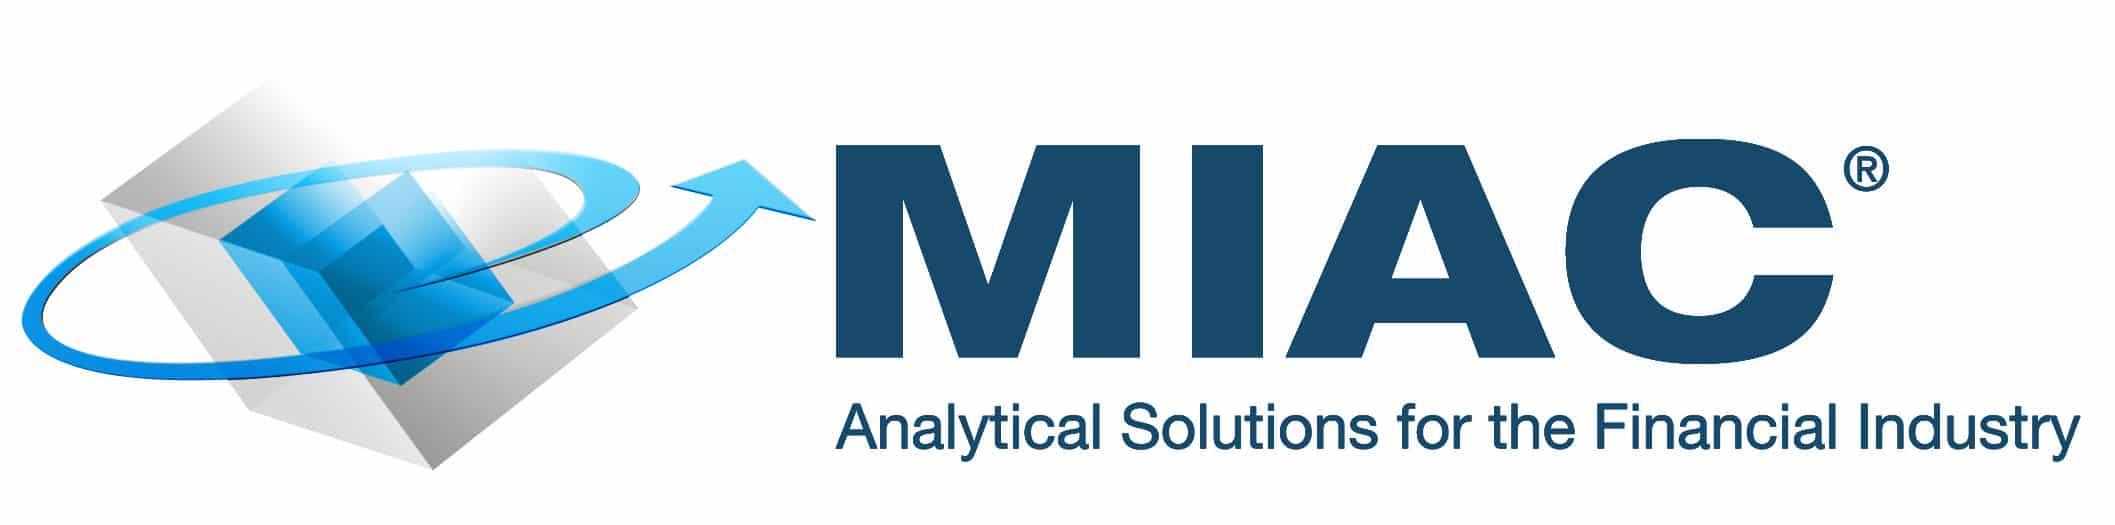 MIAC_Registered_logo